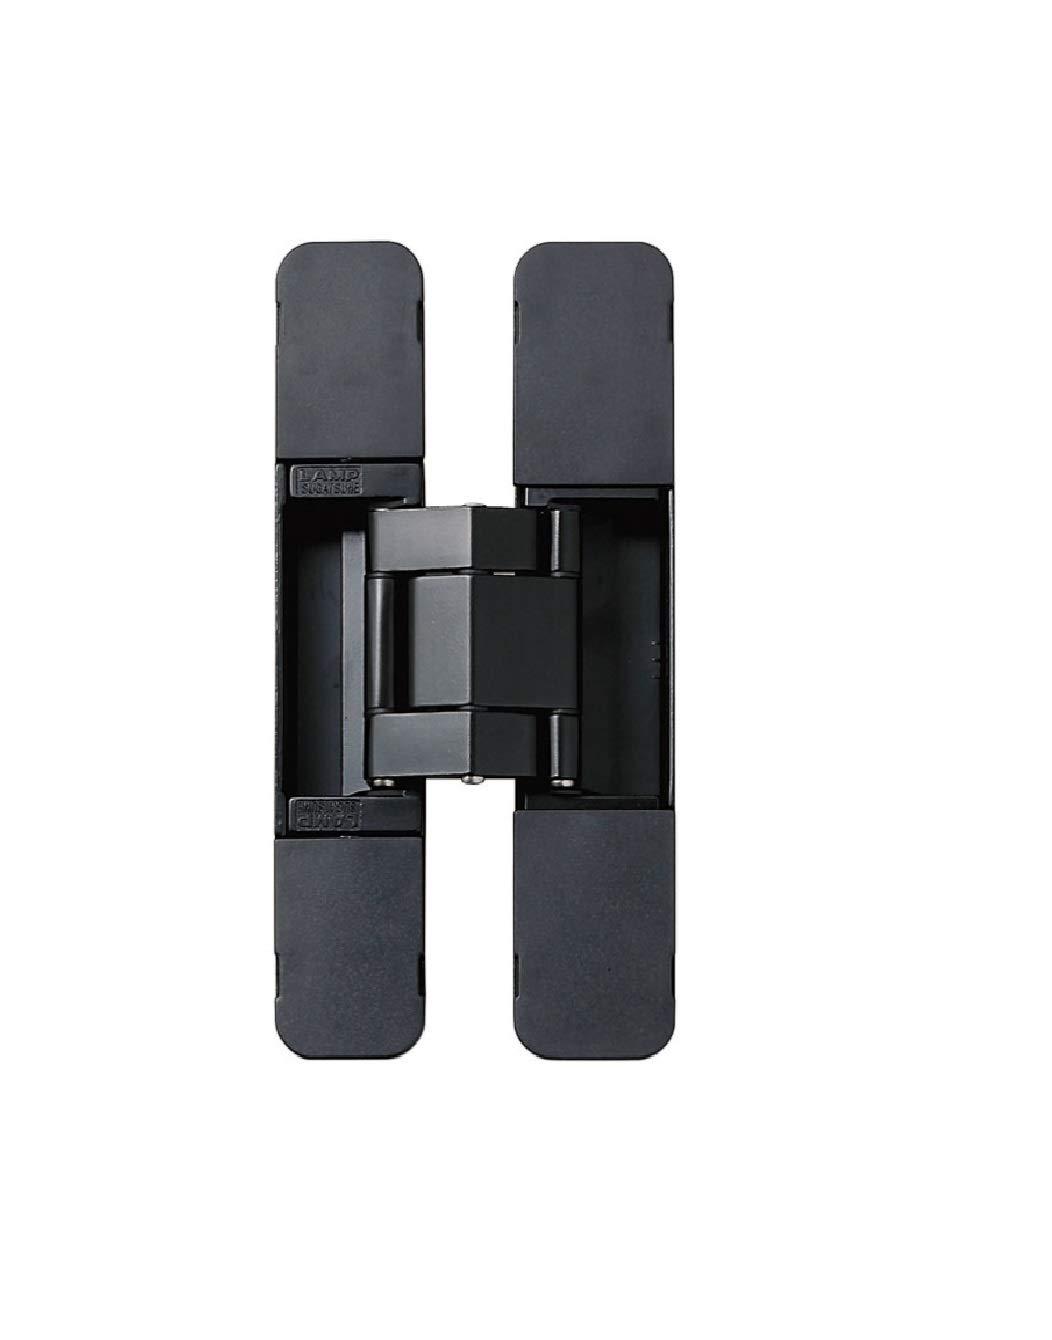 Sugatsune HES3D-E190 3-Way Adjustable Invisible Concelaed Hinge - Matte Black